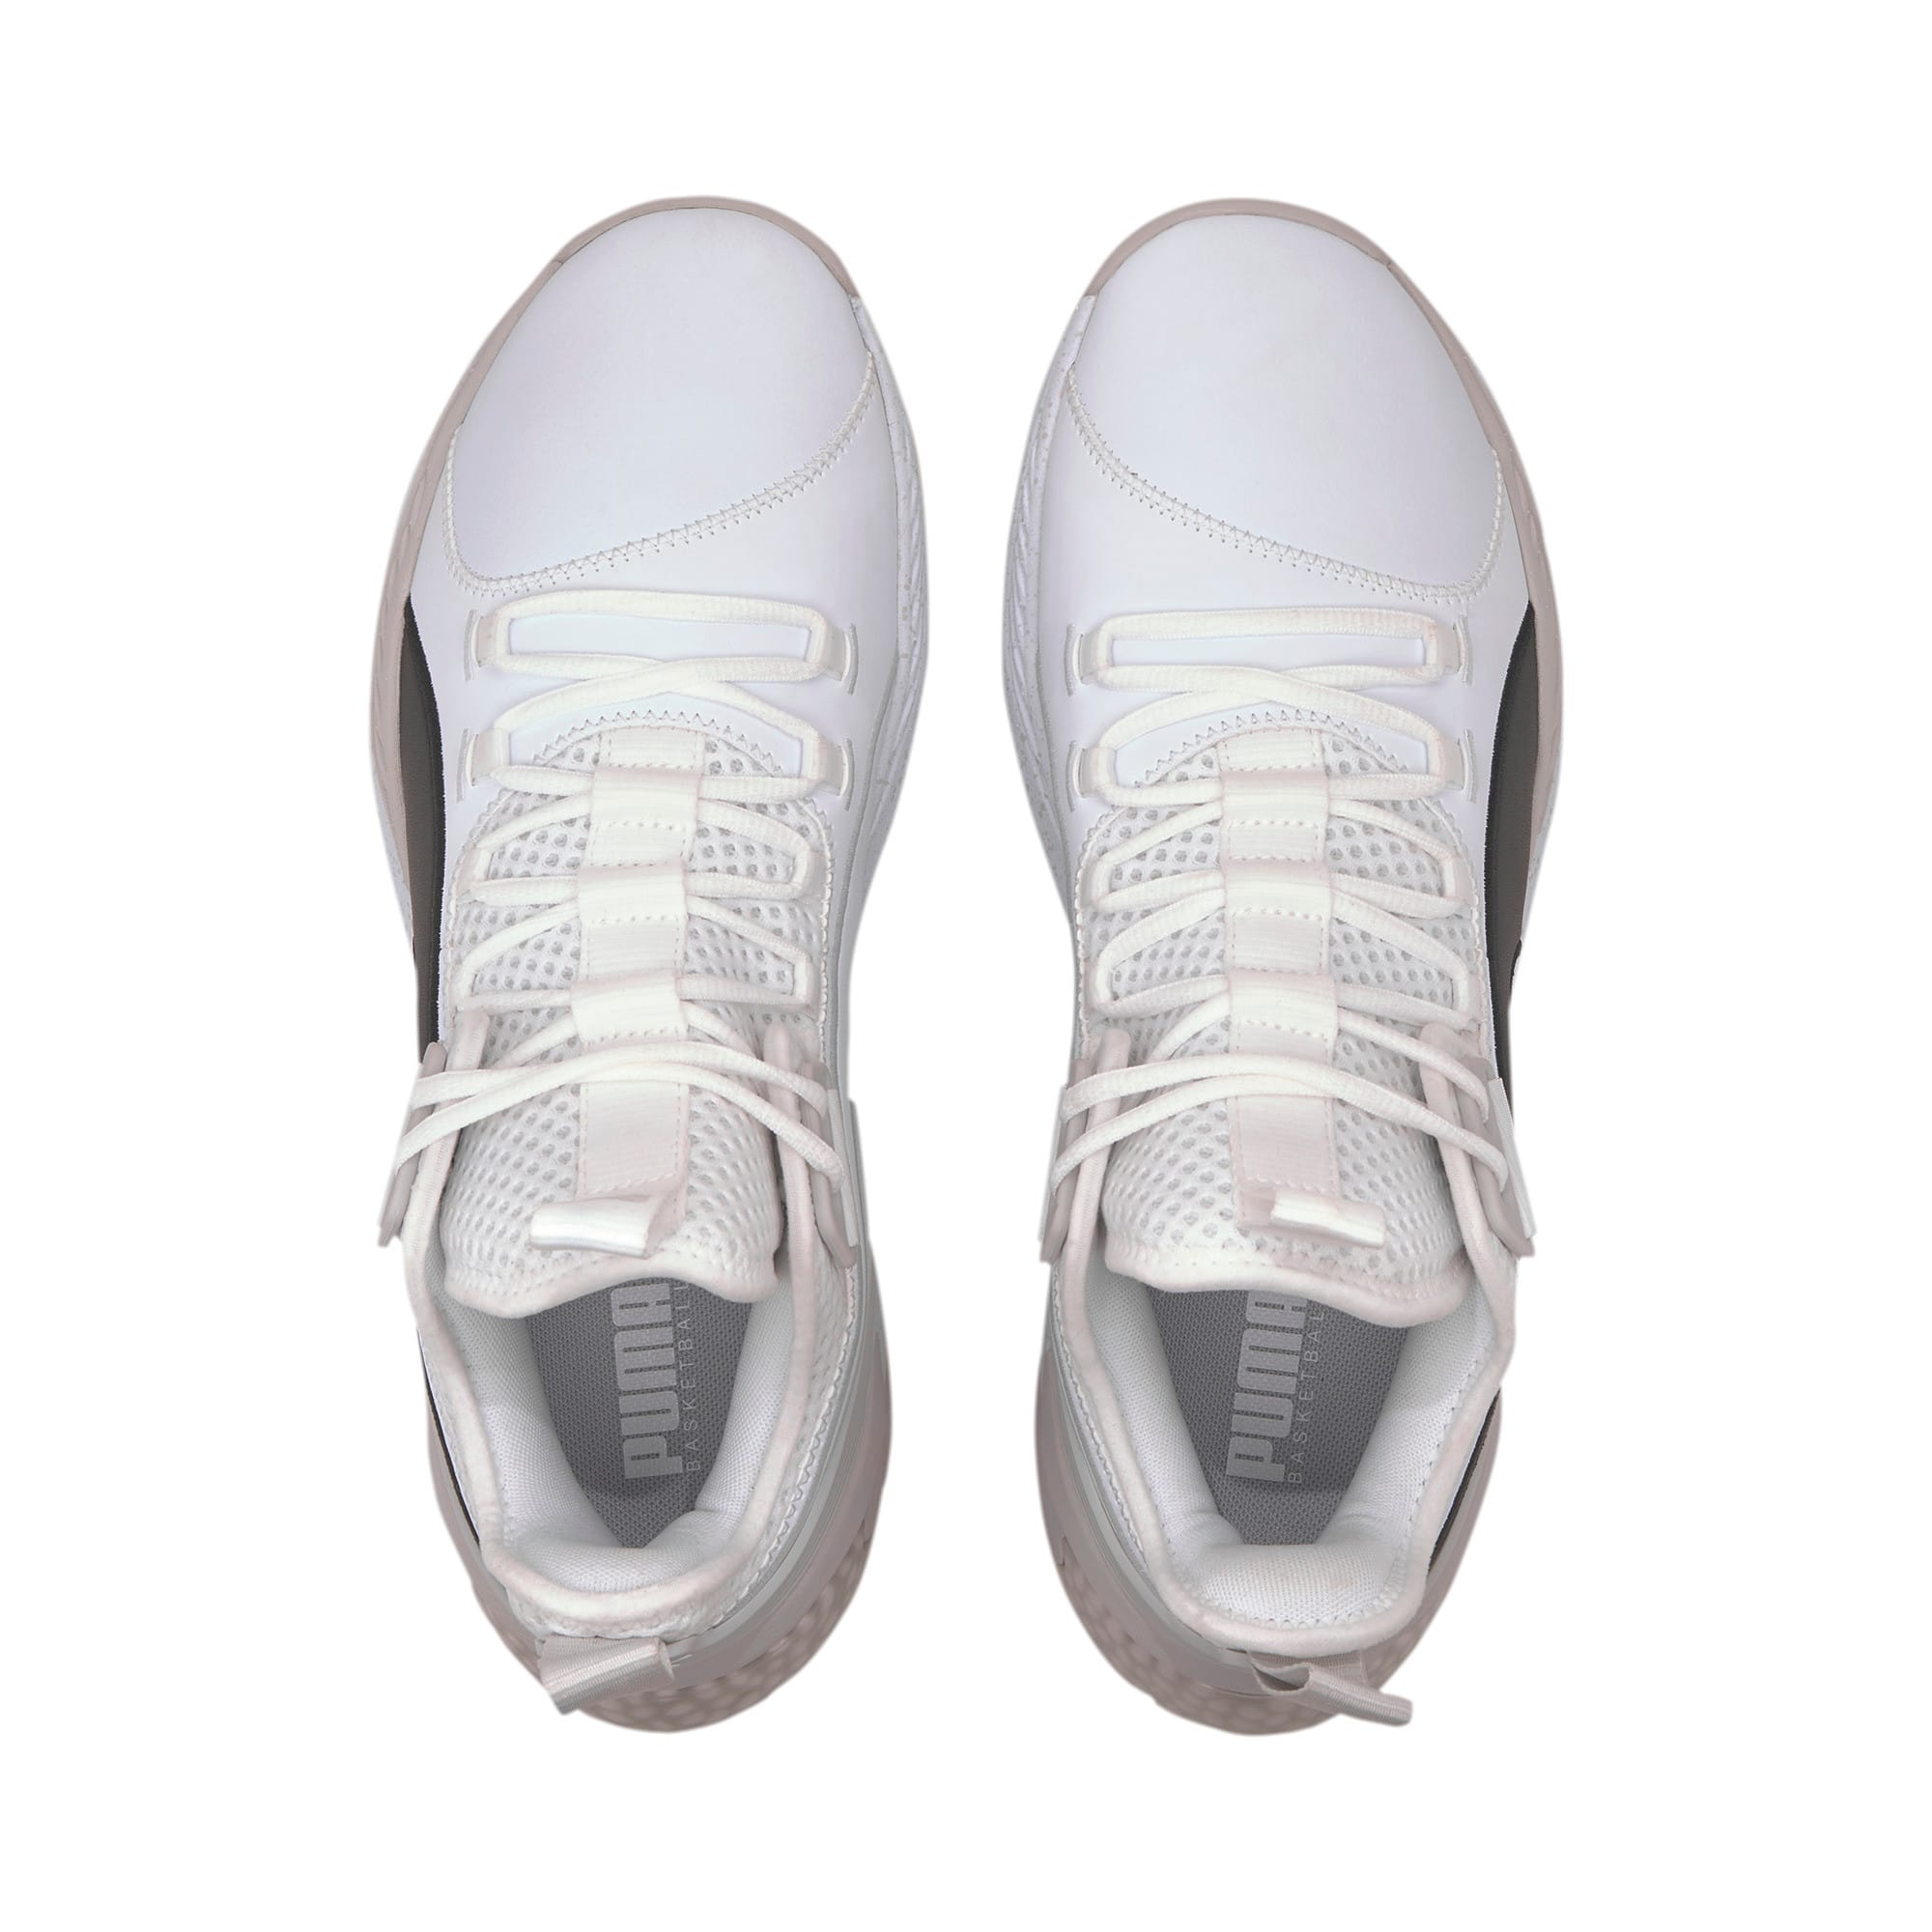 Thumbnail 6 of Uproar Core Men's Basketball Shoes, Puma White-Glacier Gray, medium